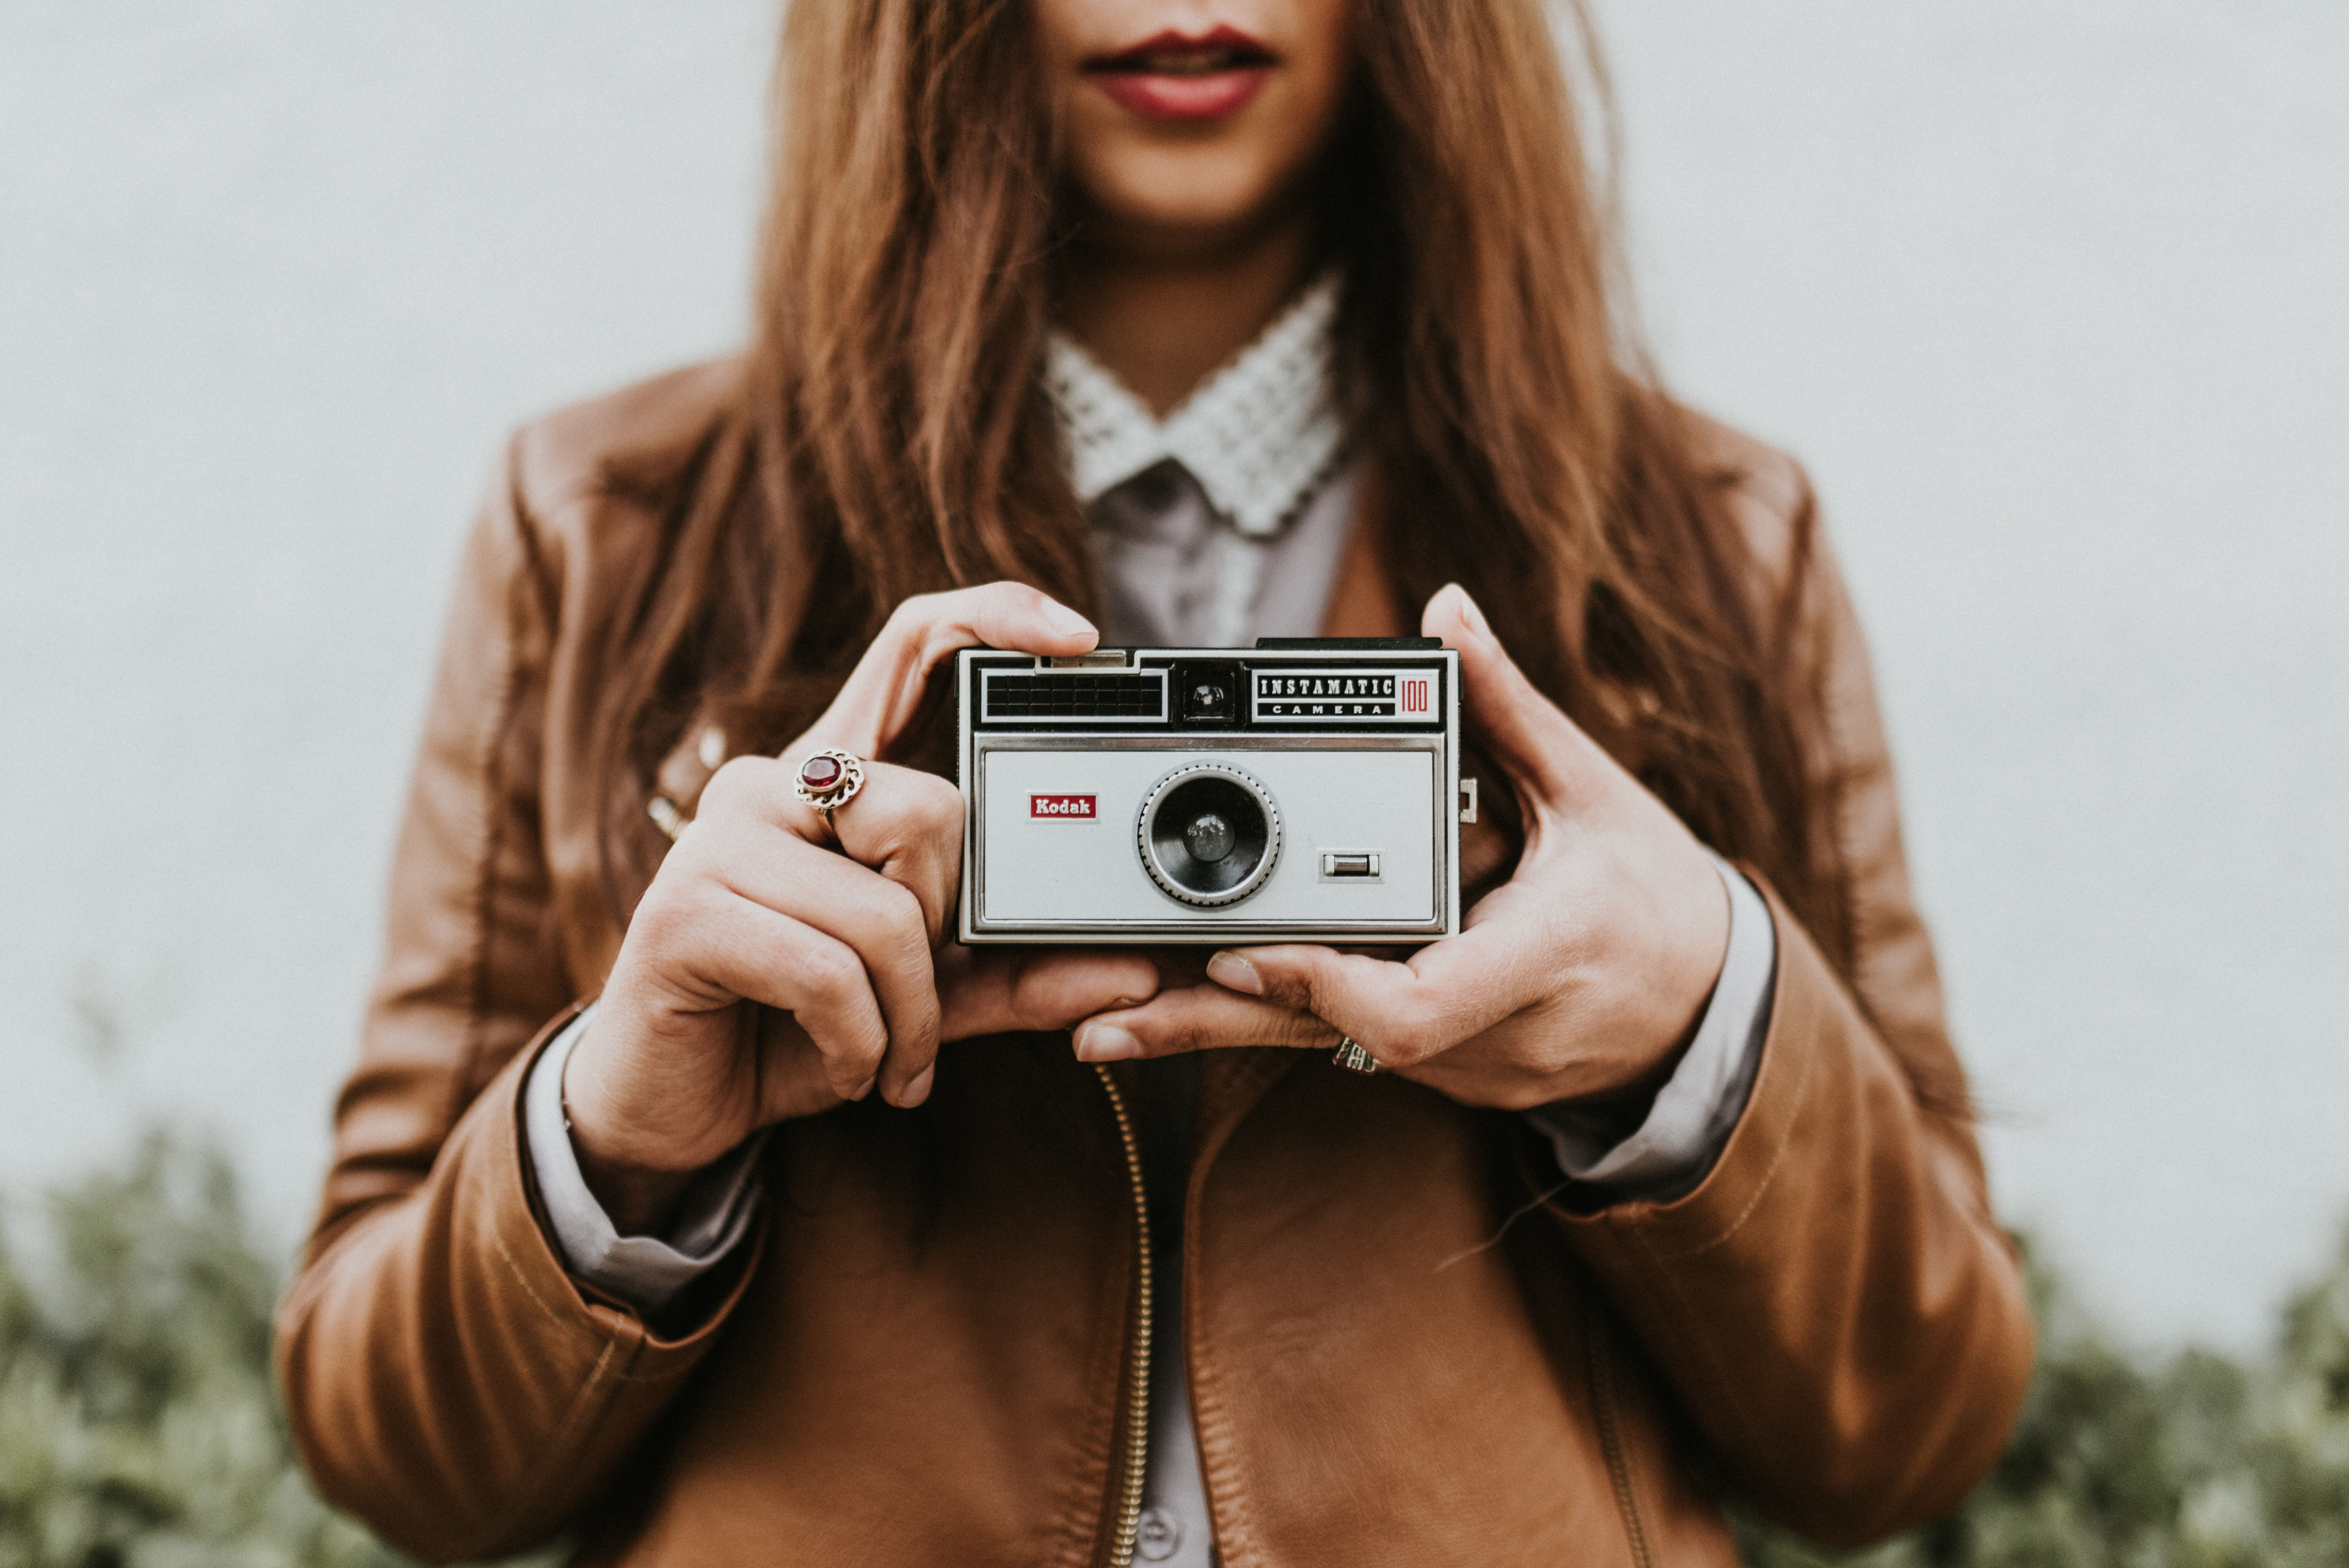 cô gái cầm máy ảnh